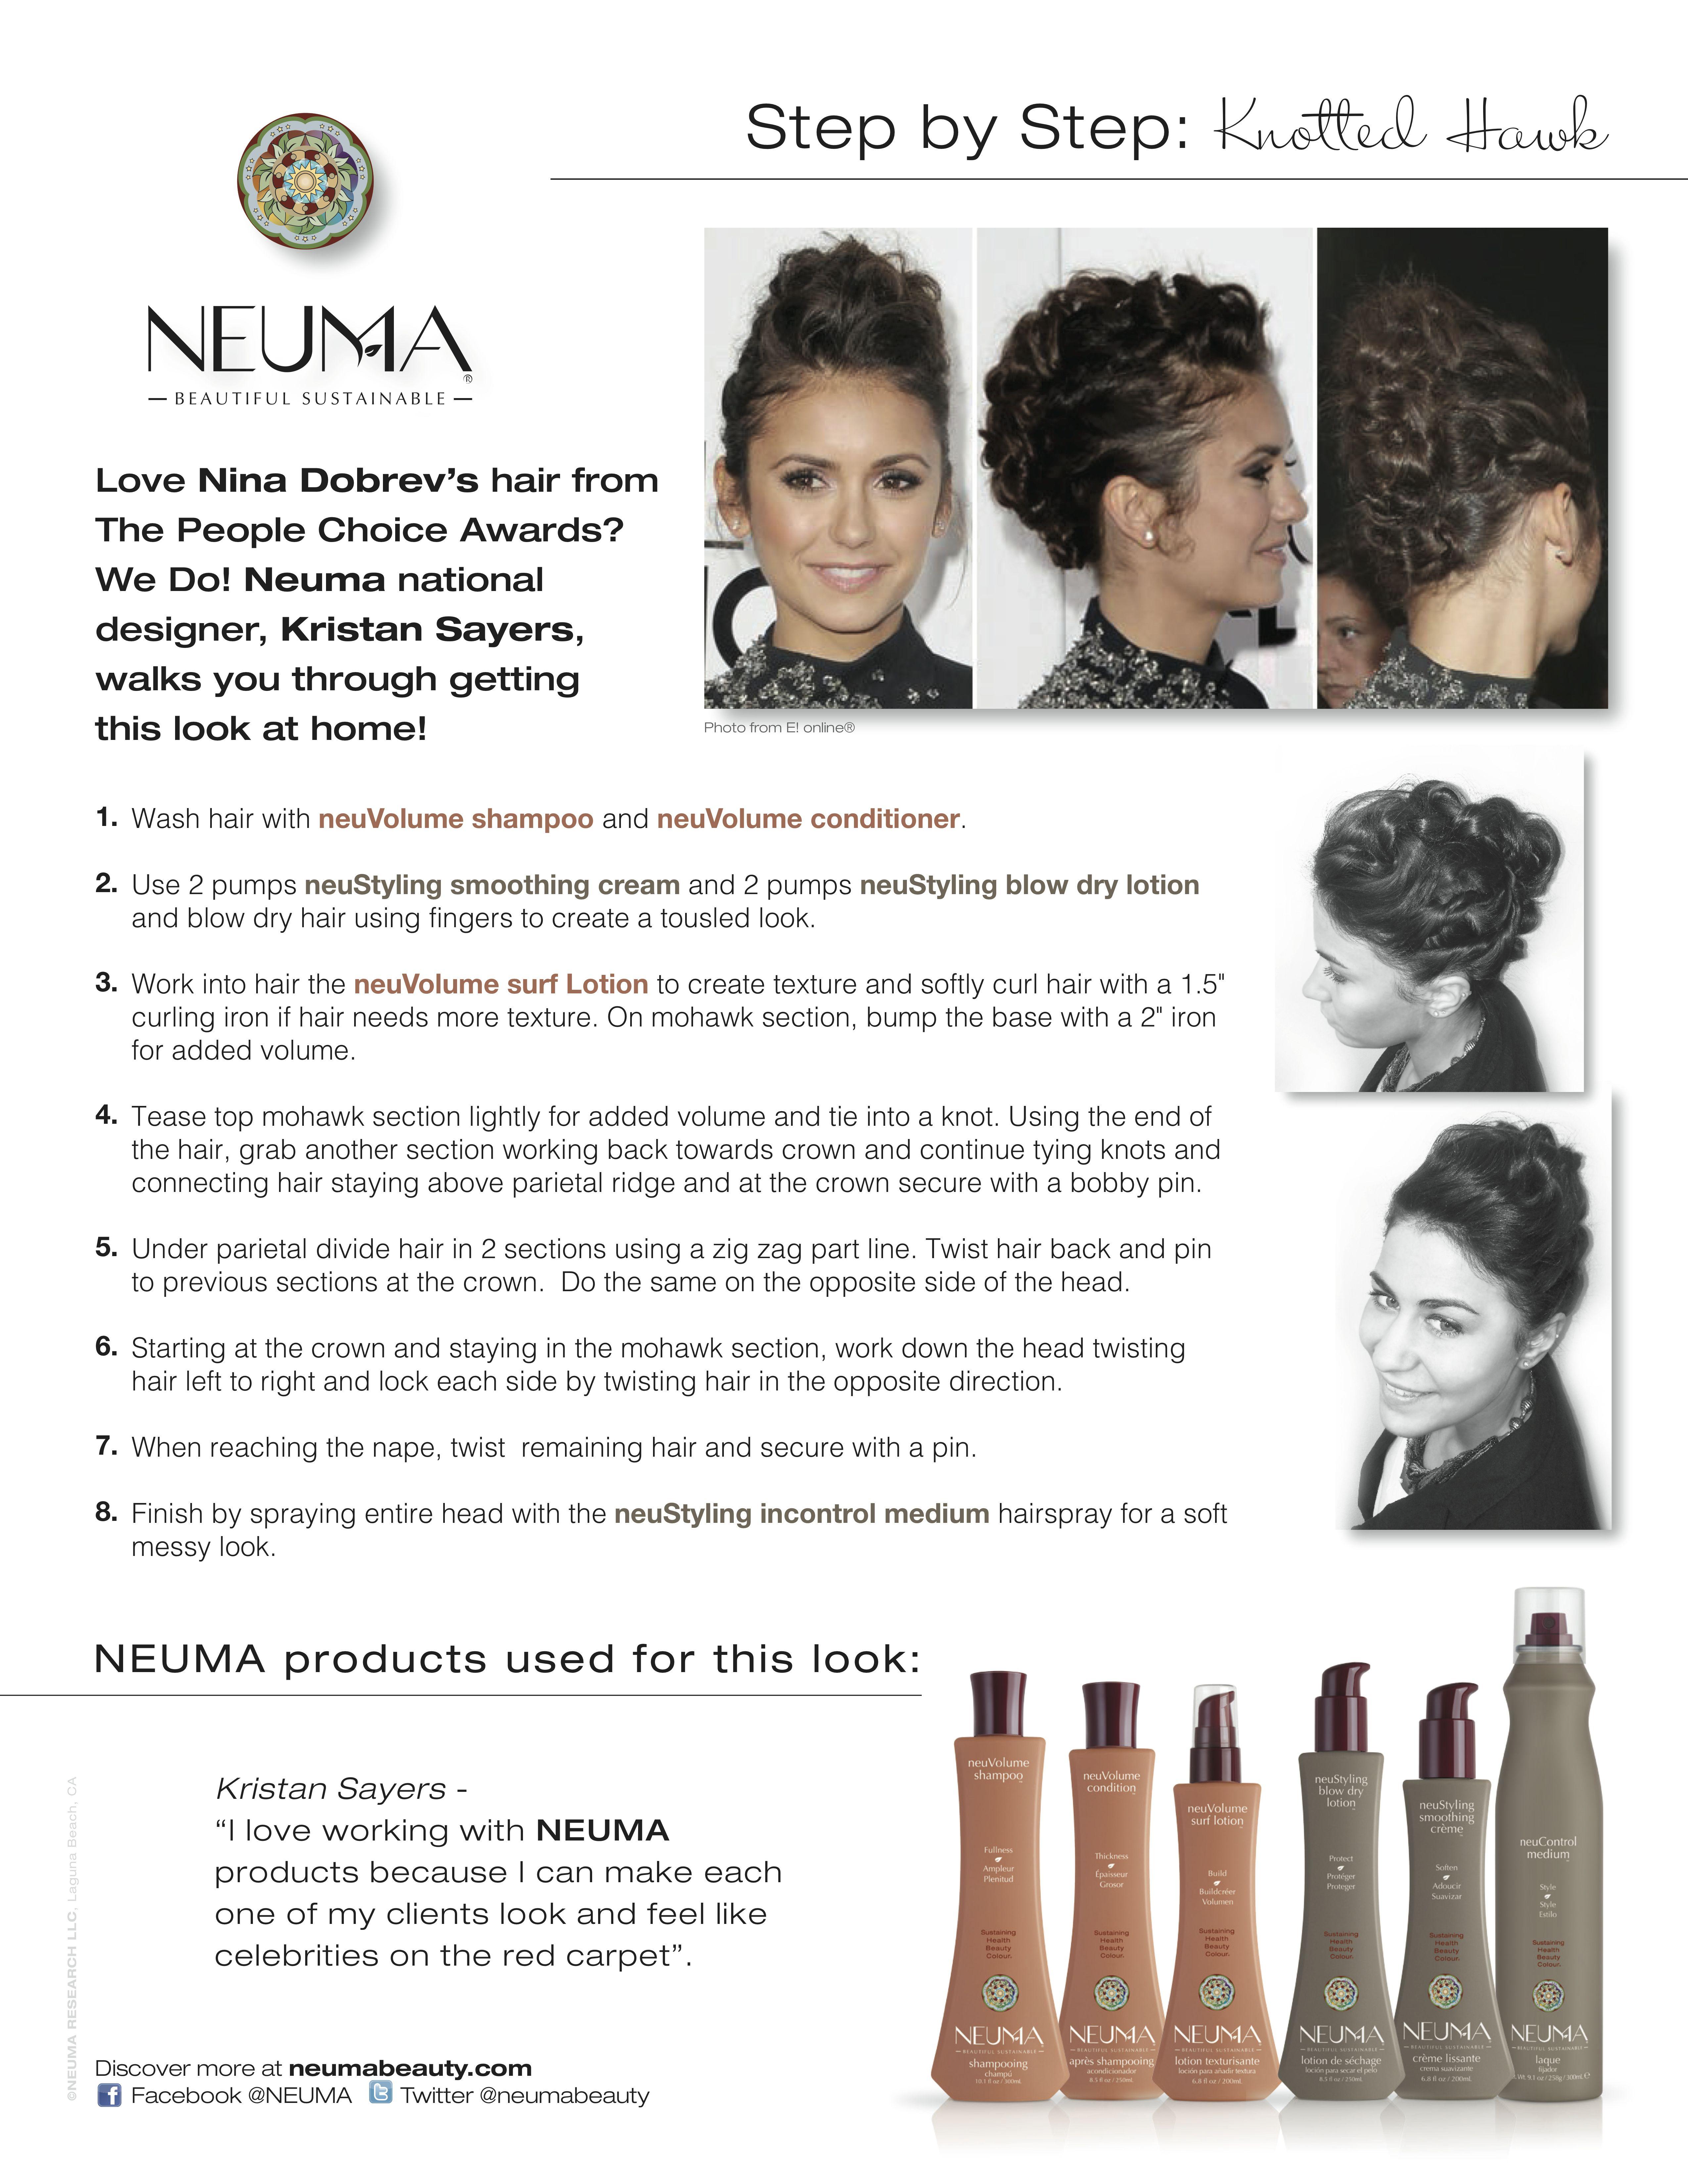 NEUMA Step by Step - Knotted Hawk